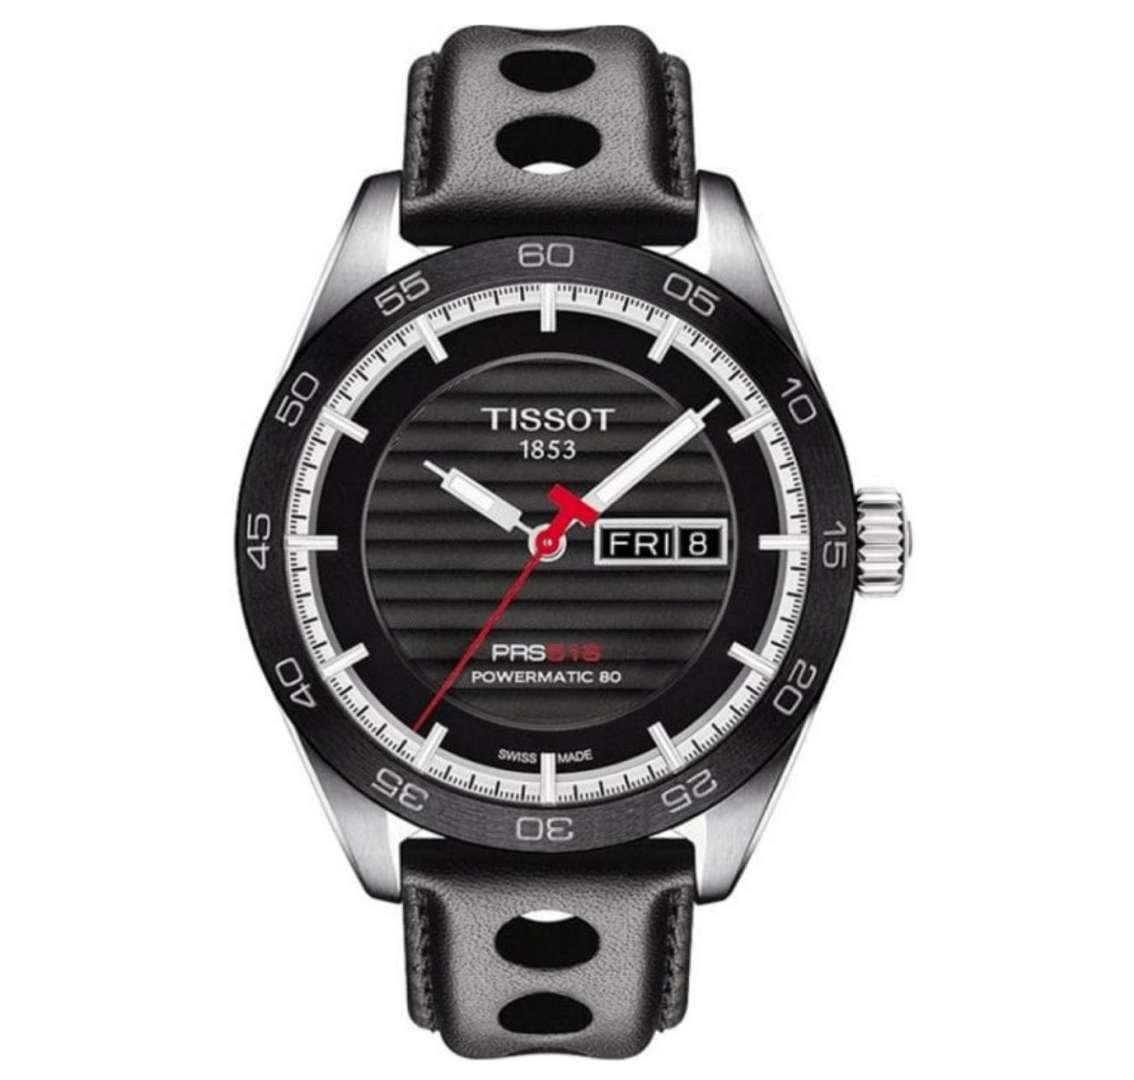 שעון יד אנלוגי tissot t100.430.16.051.00 טיסו